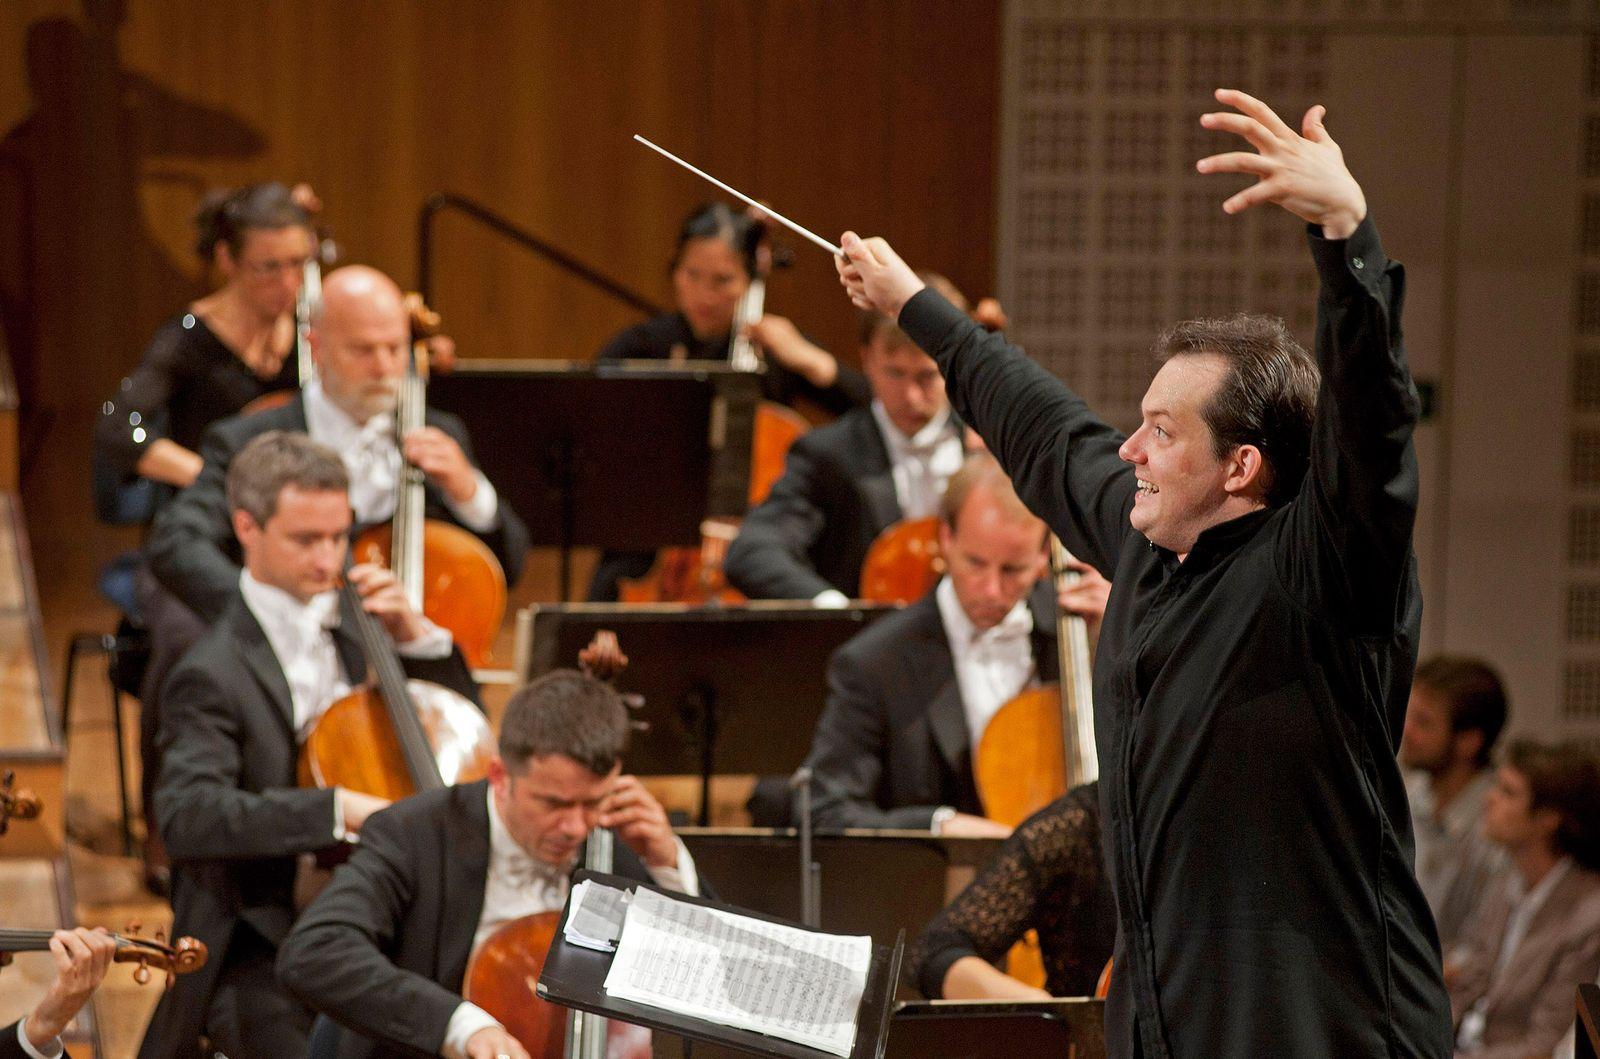 TAGESKARTE 30.06.12/ Klassik/ Andris Nelson/ Concertgebouw Orchestra